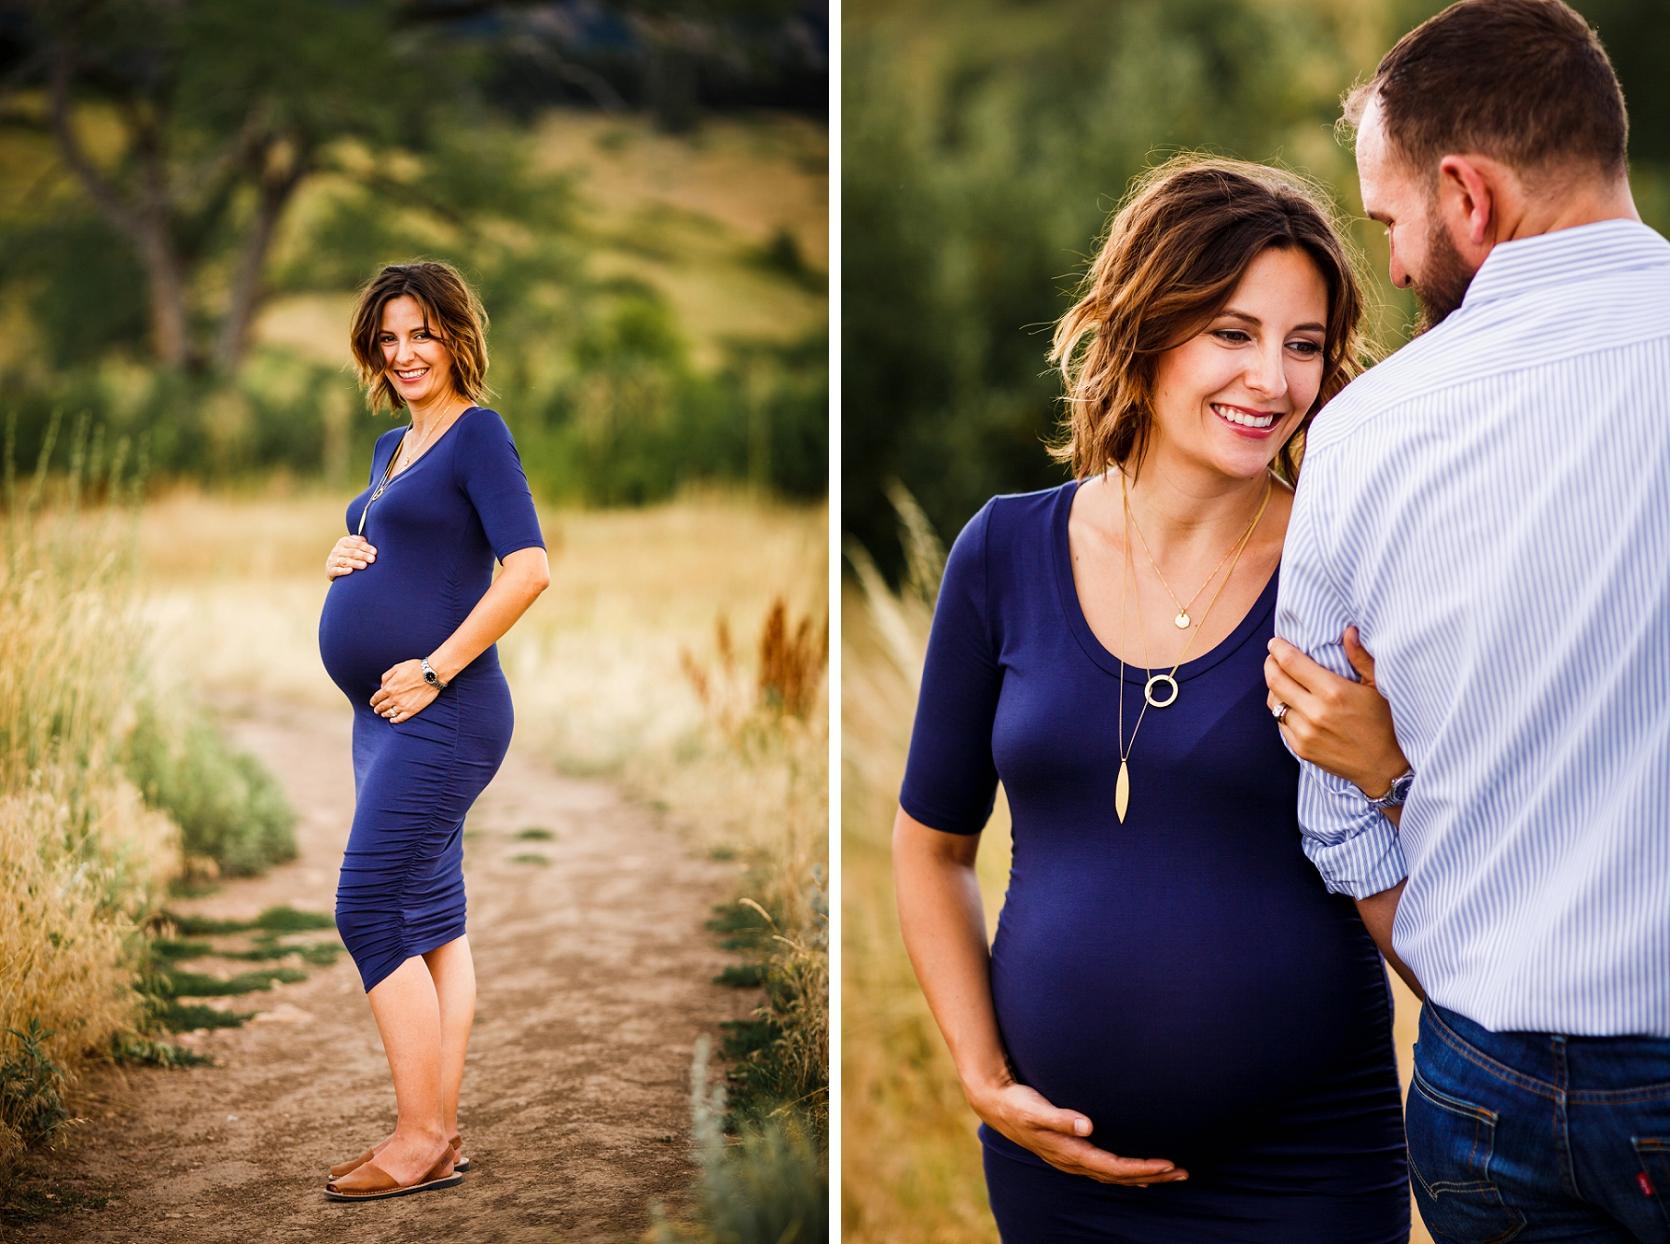 South_Mesa_Trailhead_Maternity_Session_0006